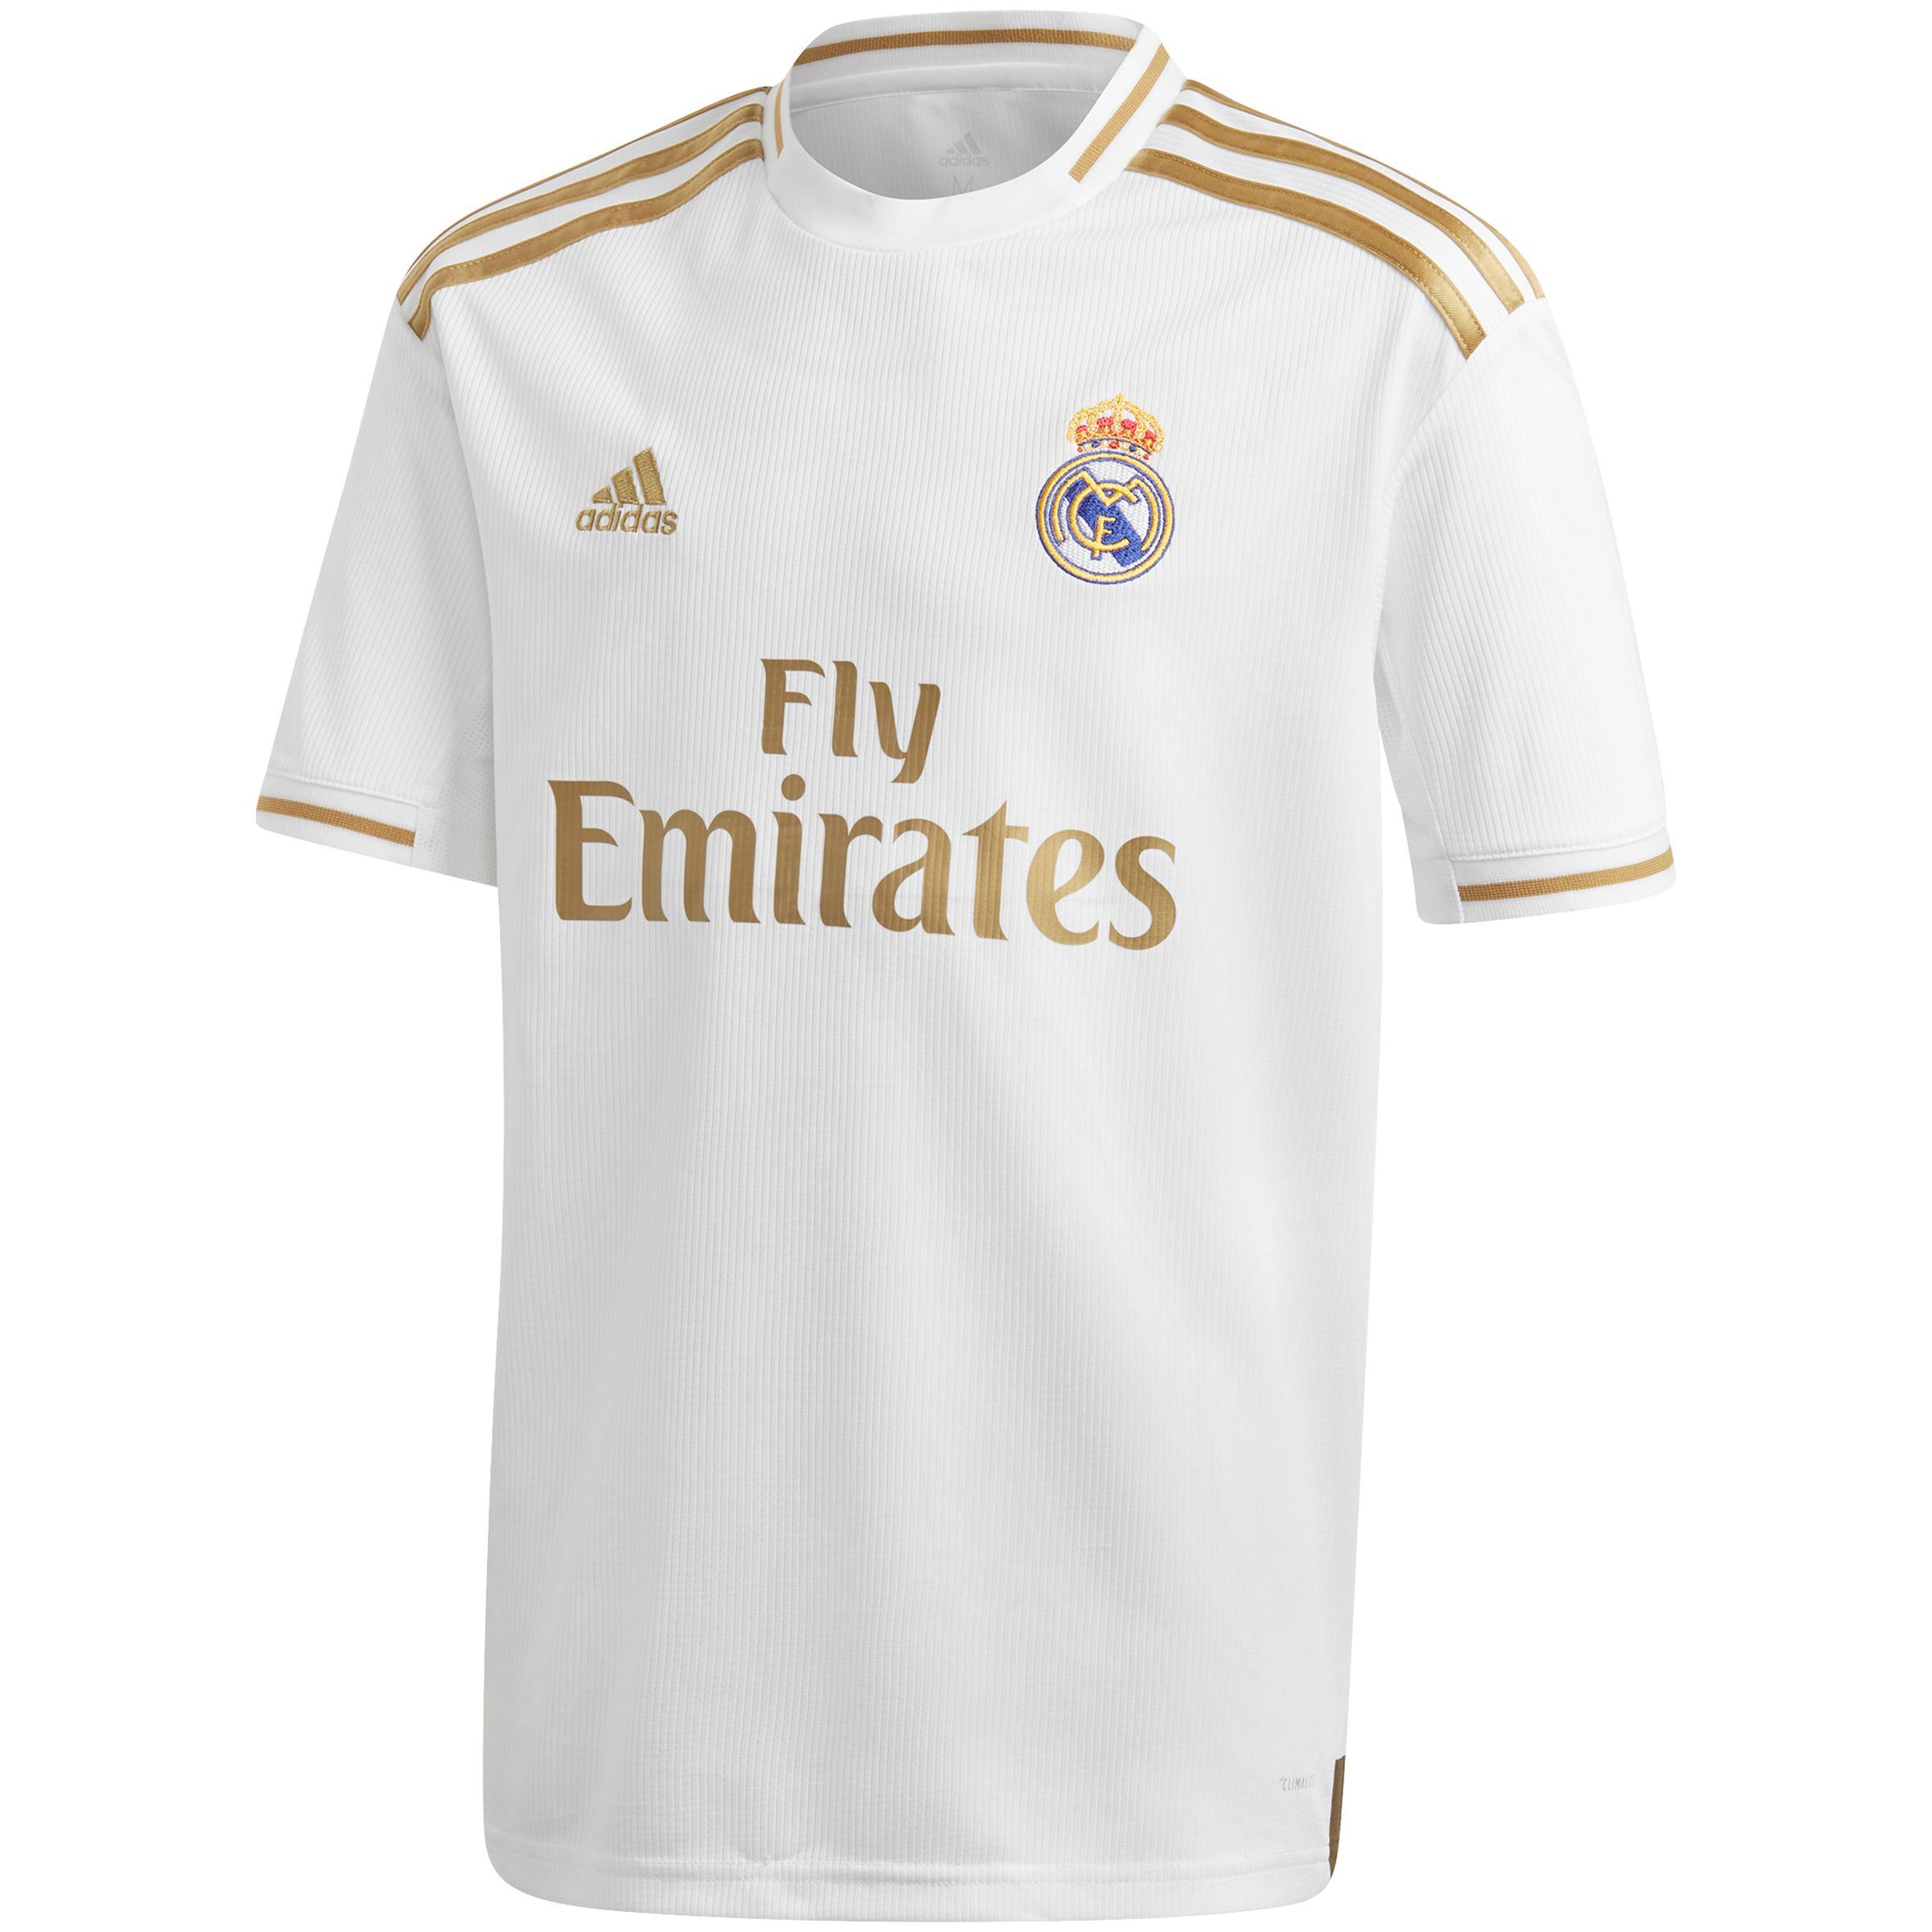 fly emirates shirt adidas jersey on sale